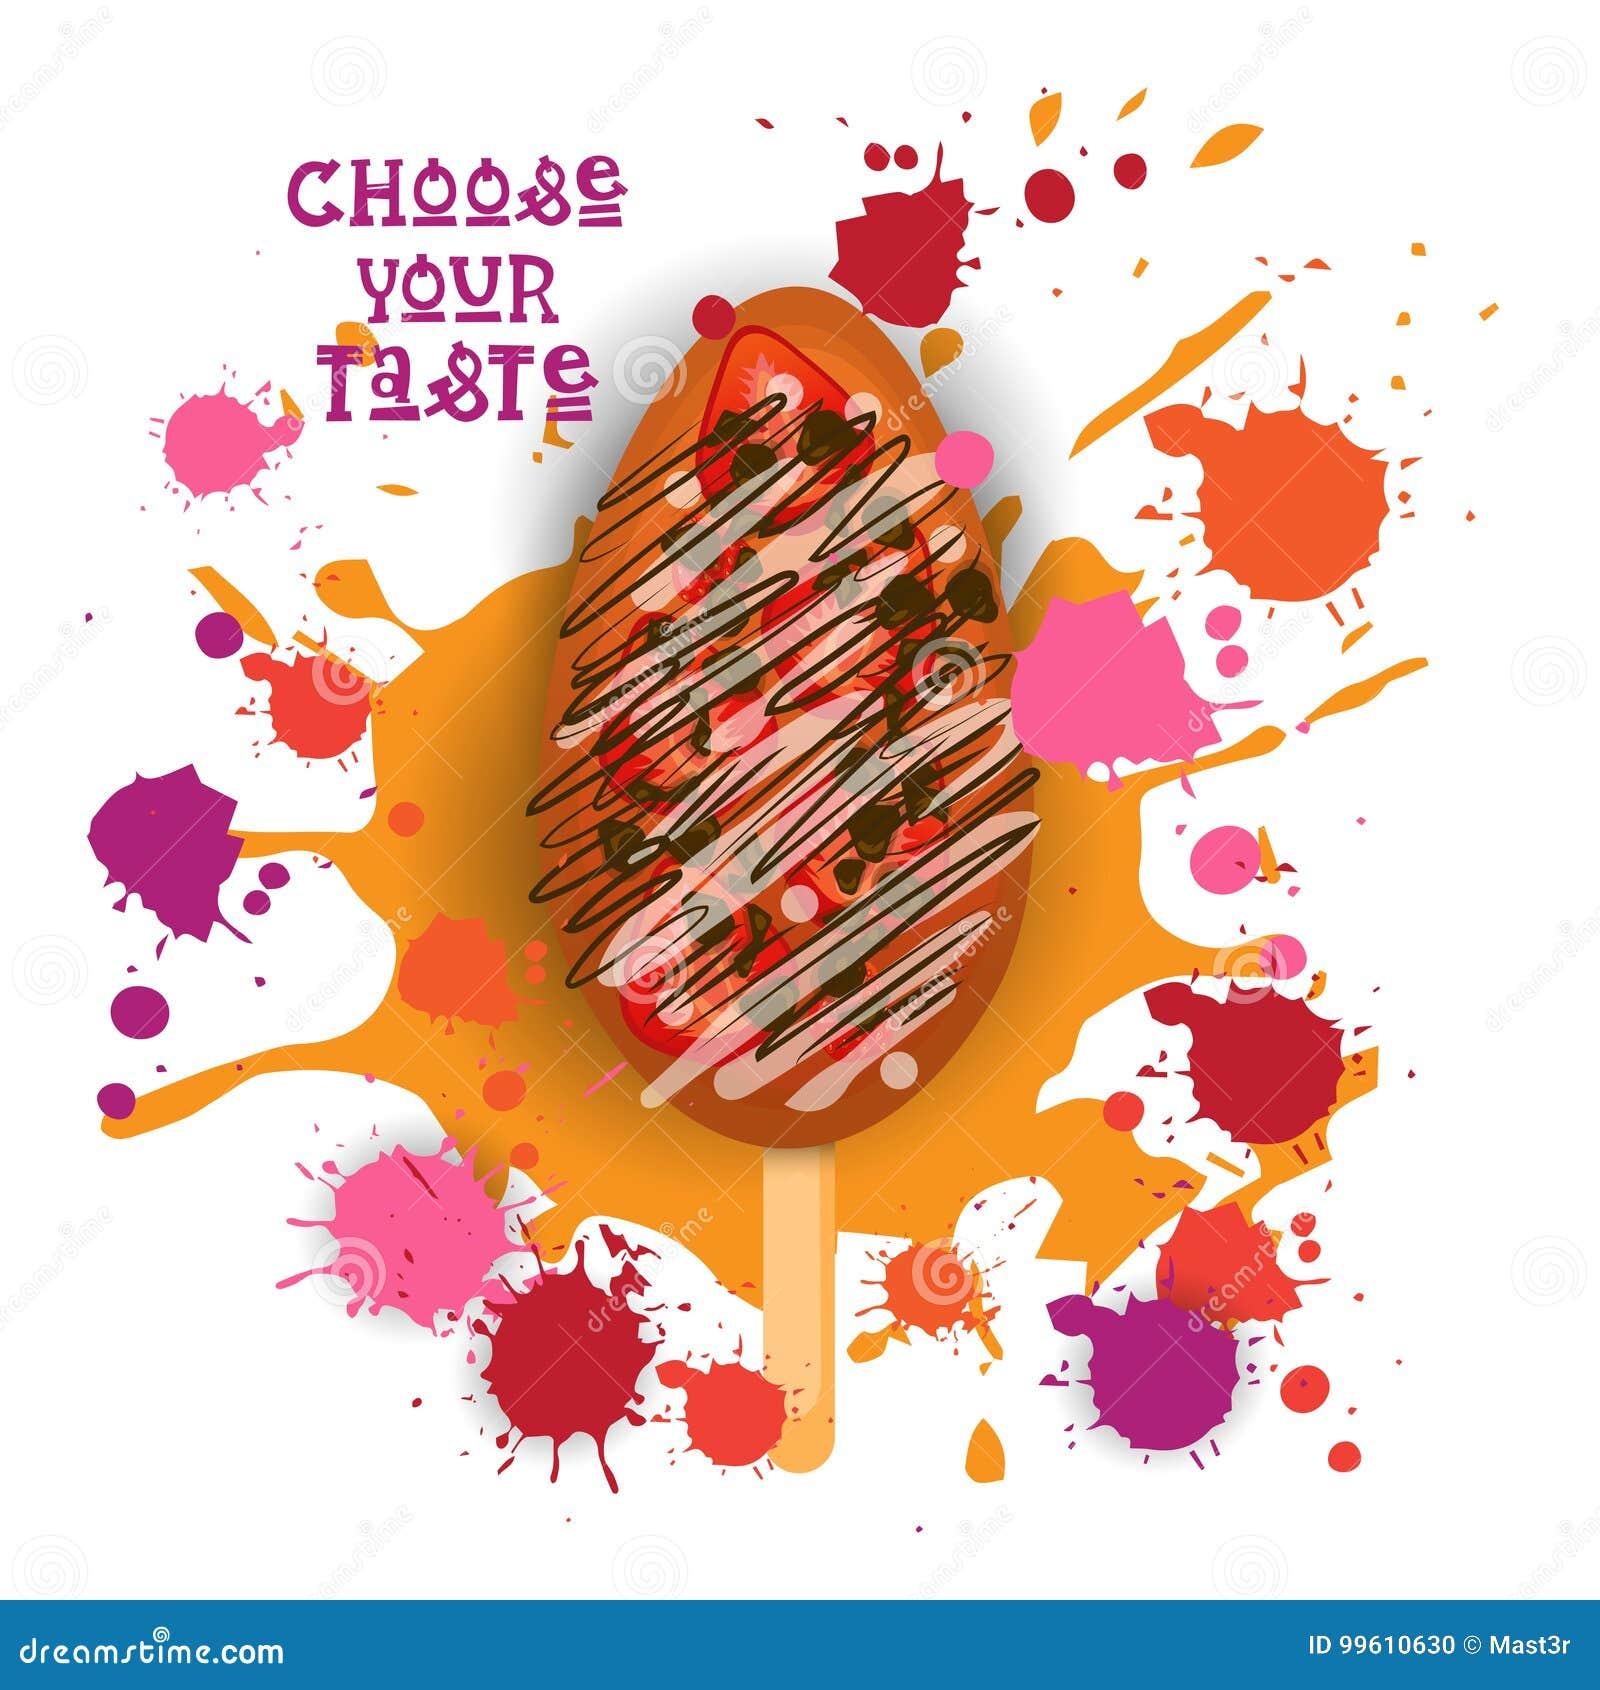 Eiscreme Lolly Colorful Dessert Icon Choose Ihr Geschmack-Café-Plakat